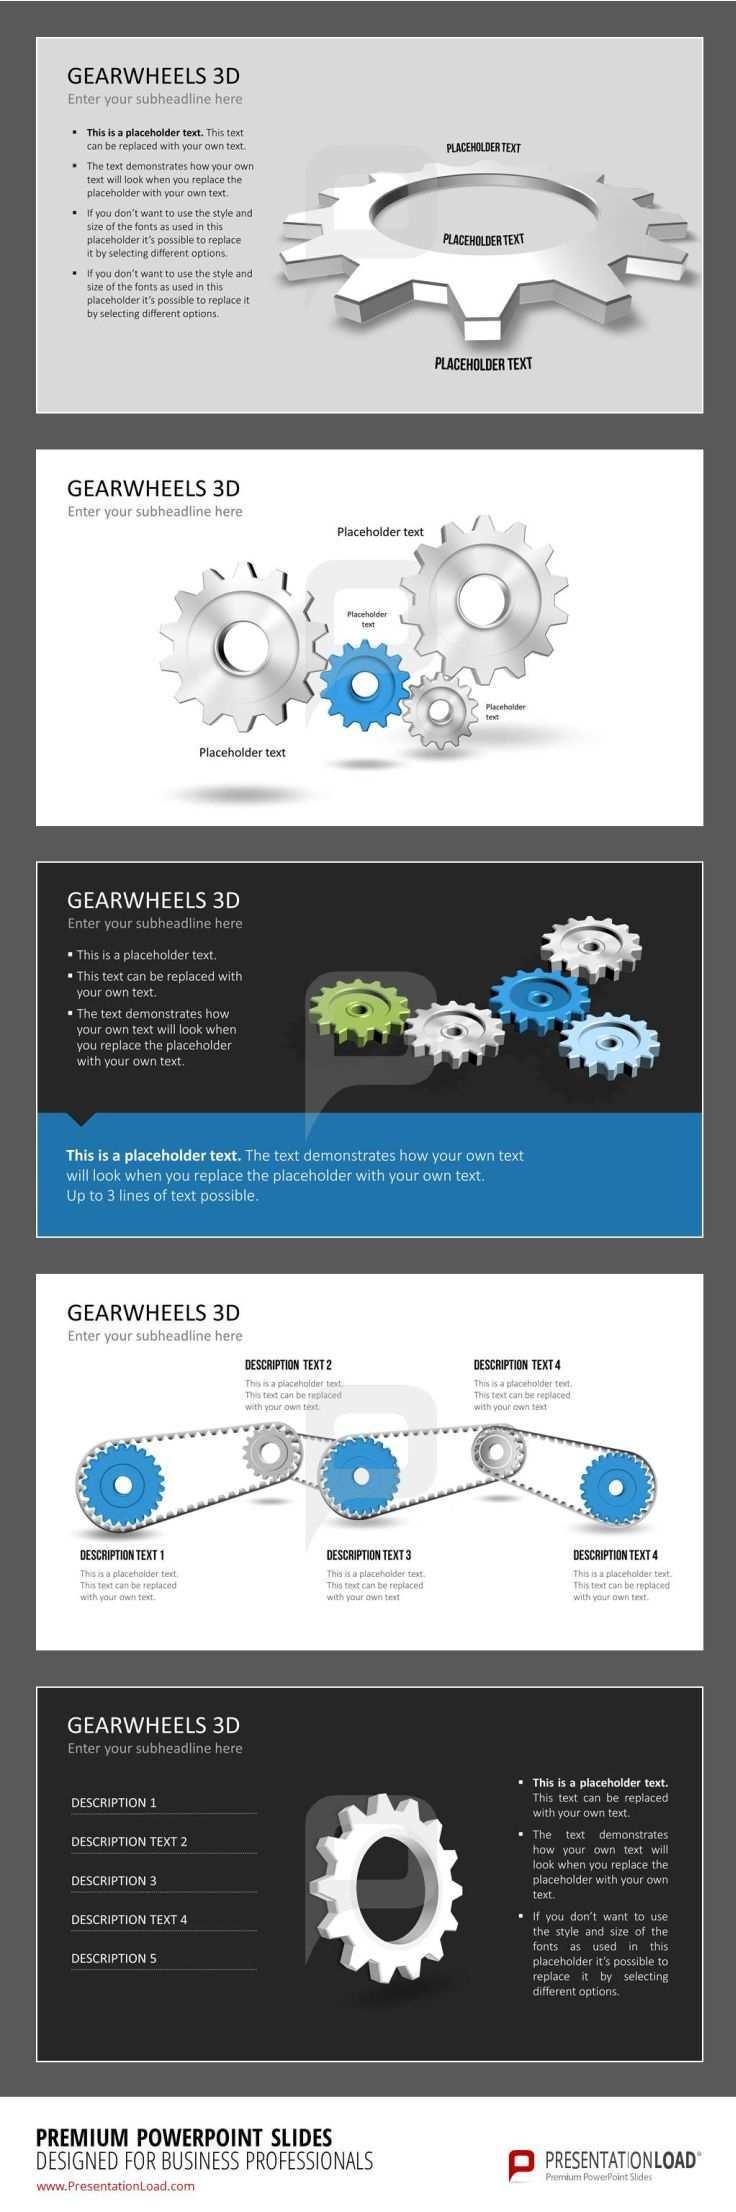 A Variation Of Different Gearwheel 3d Slides Powerpoint Slide Designs Powerpoint Templates Slide Design